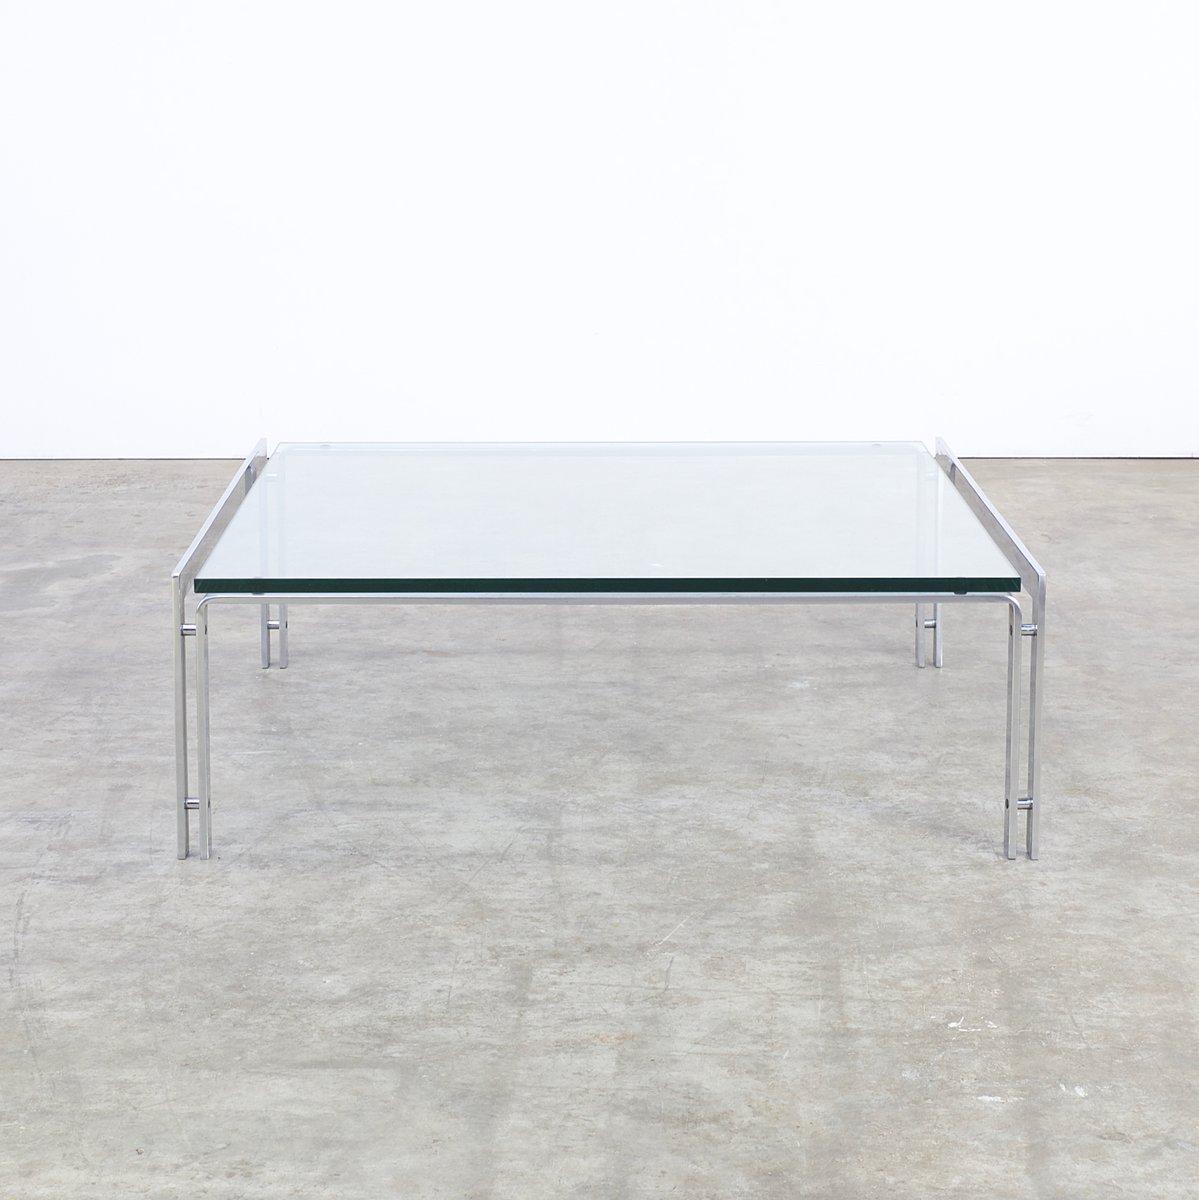 m glass  chrome coffee table from metaform s for sale at pamono - m glass  chrome coffee table from metaform s